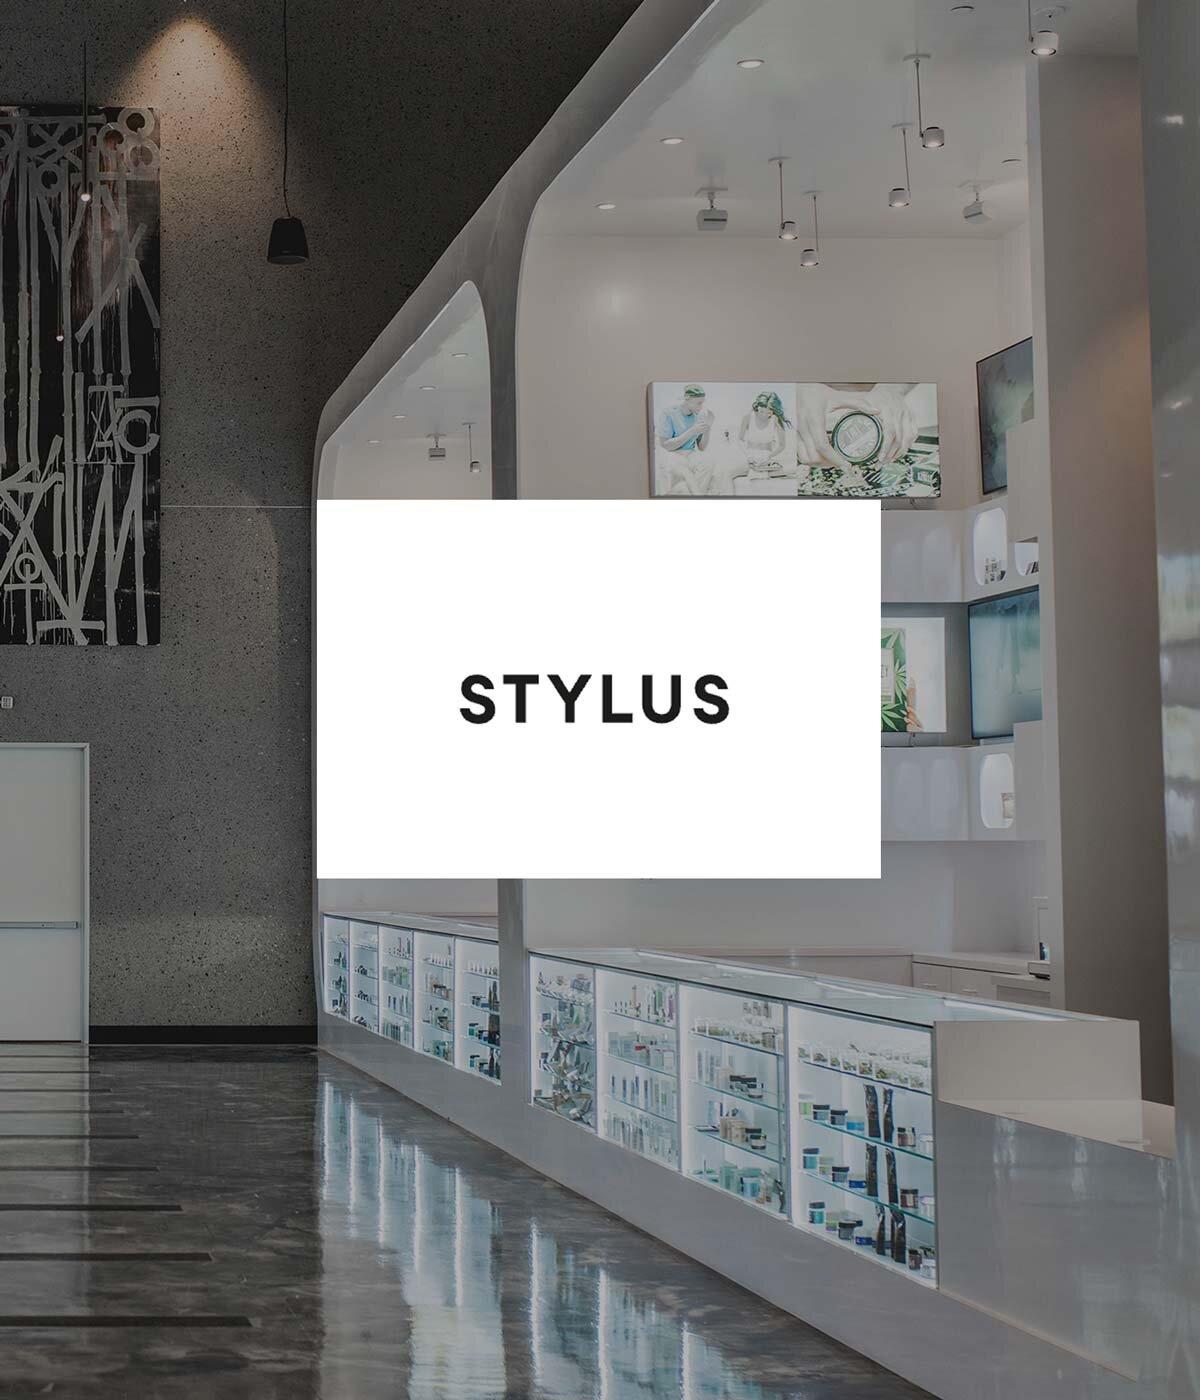 Stylus.jpg